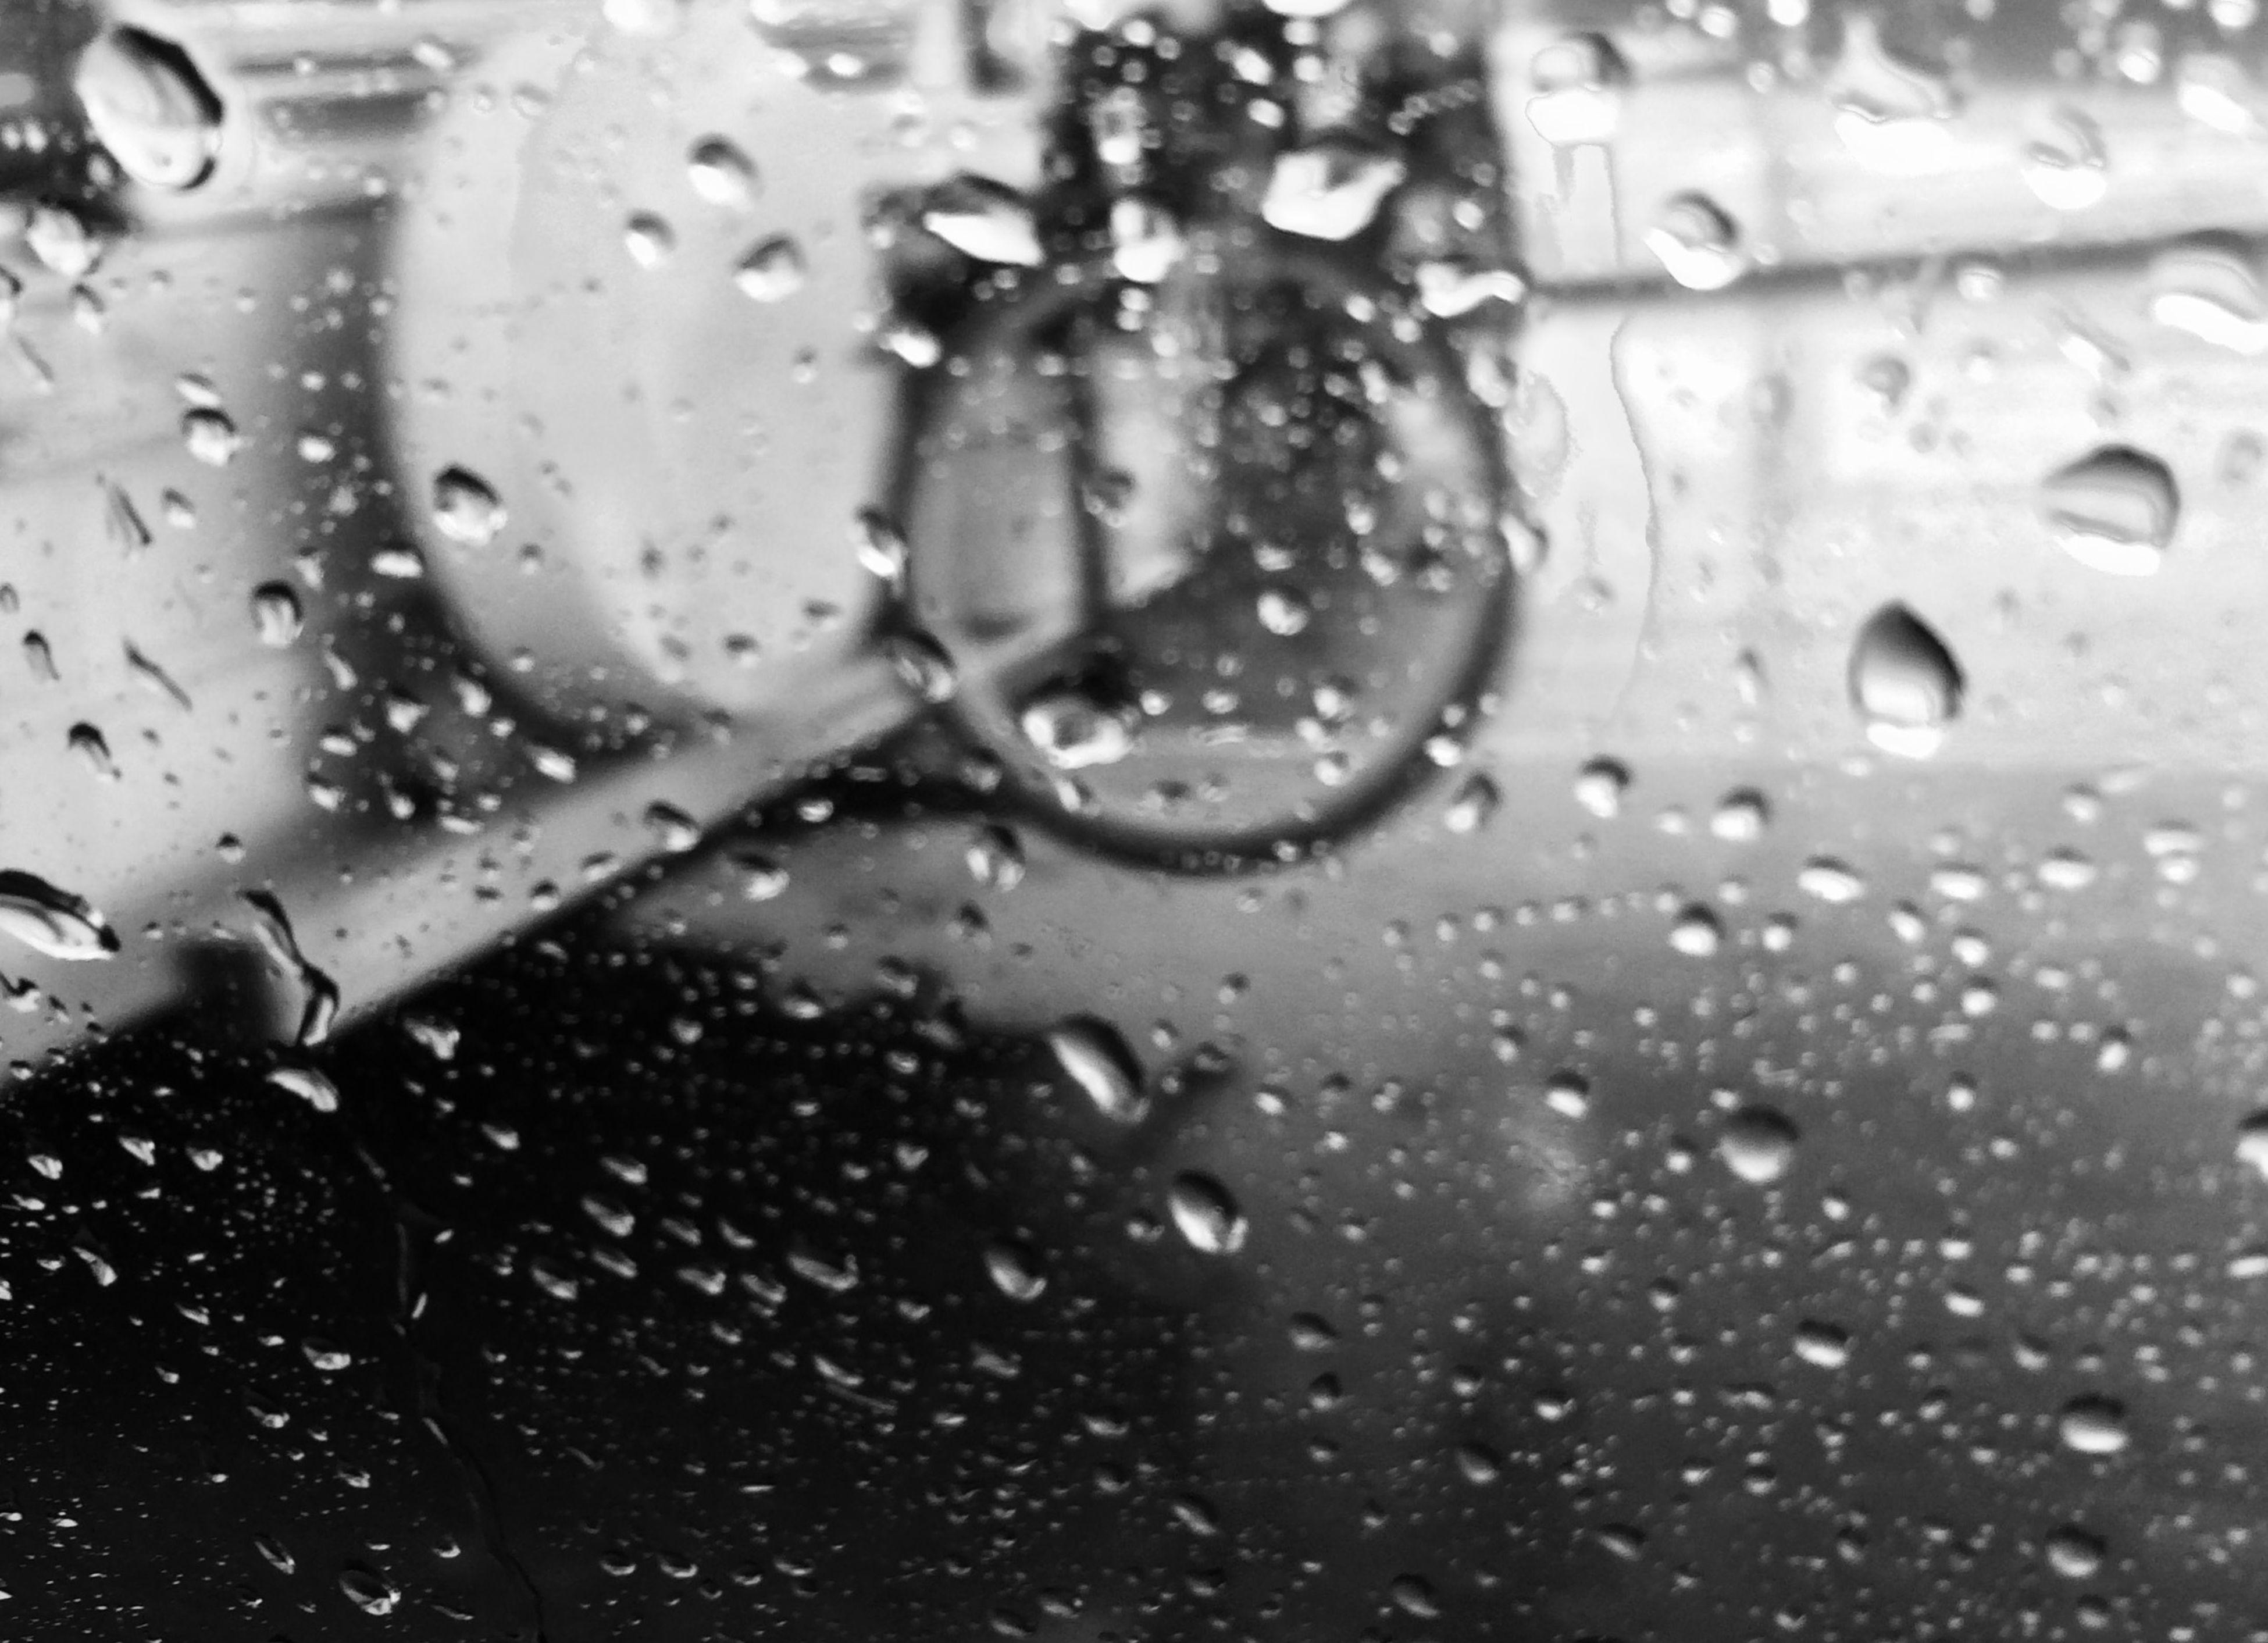 drop, wet, water, rain, raindrop, window, close-up, weather, season, transparent, glass - material, indoors, full frame, backgrounds, monsoon, droplet, water drop, focus on foreground, car, rainy season